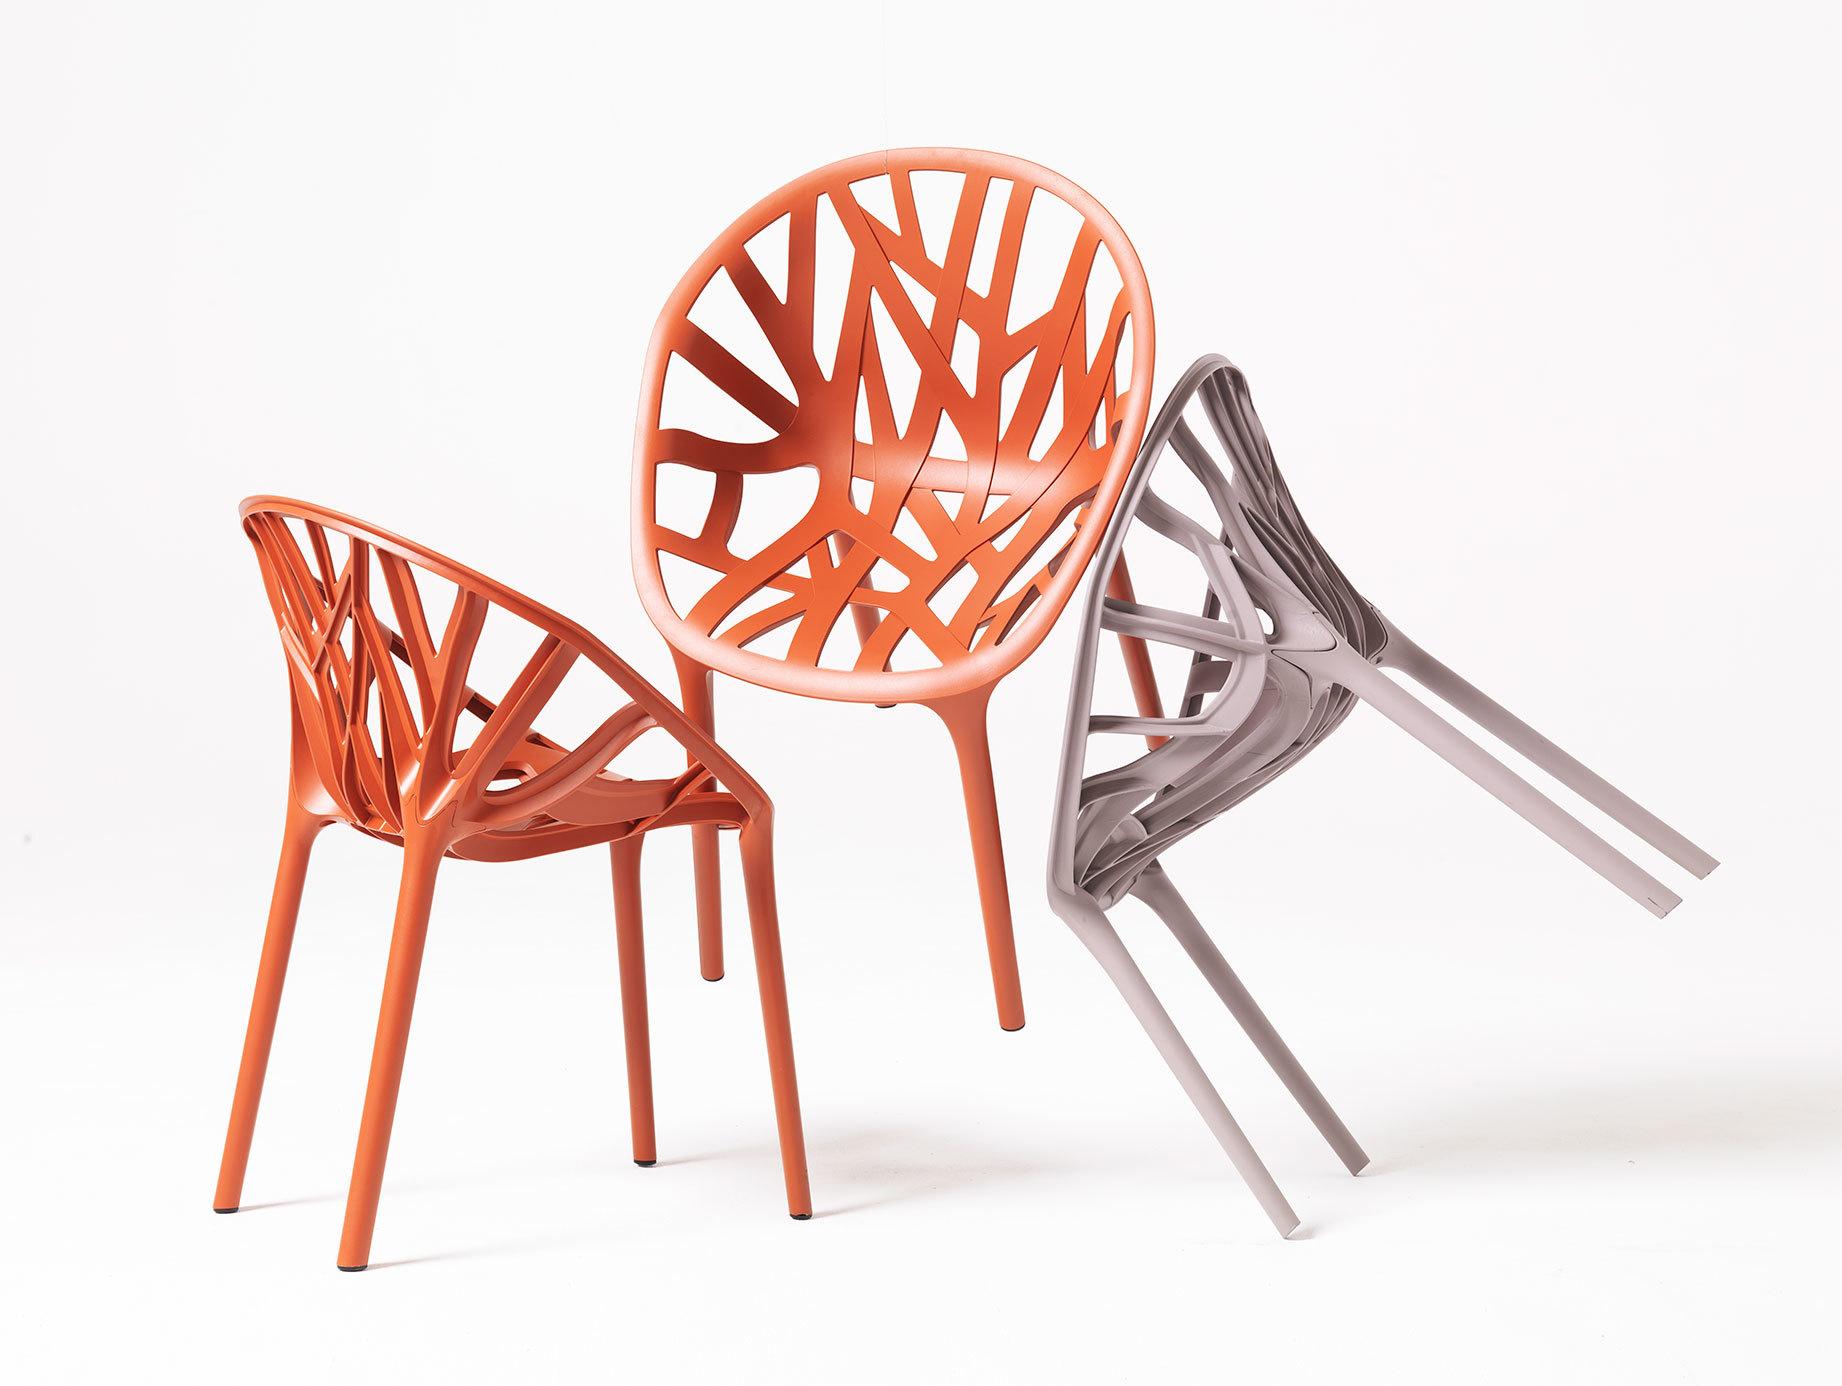 Vitra Vegetal Chairs Ronan Erwan Bouroullec